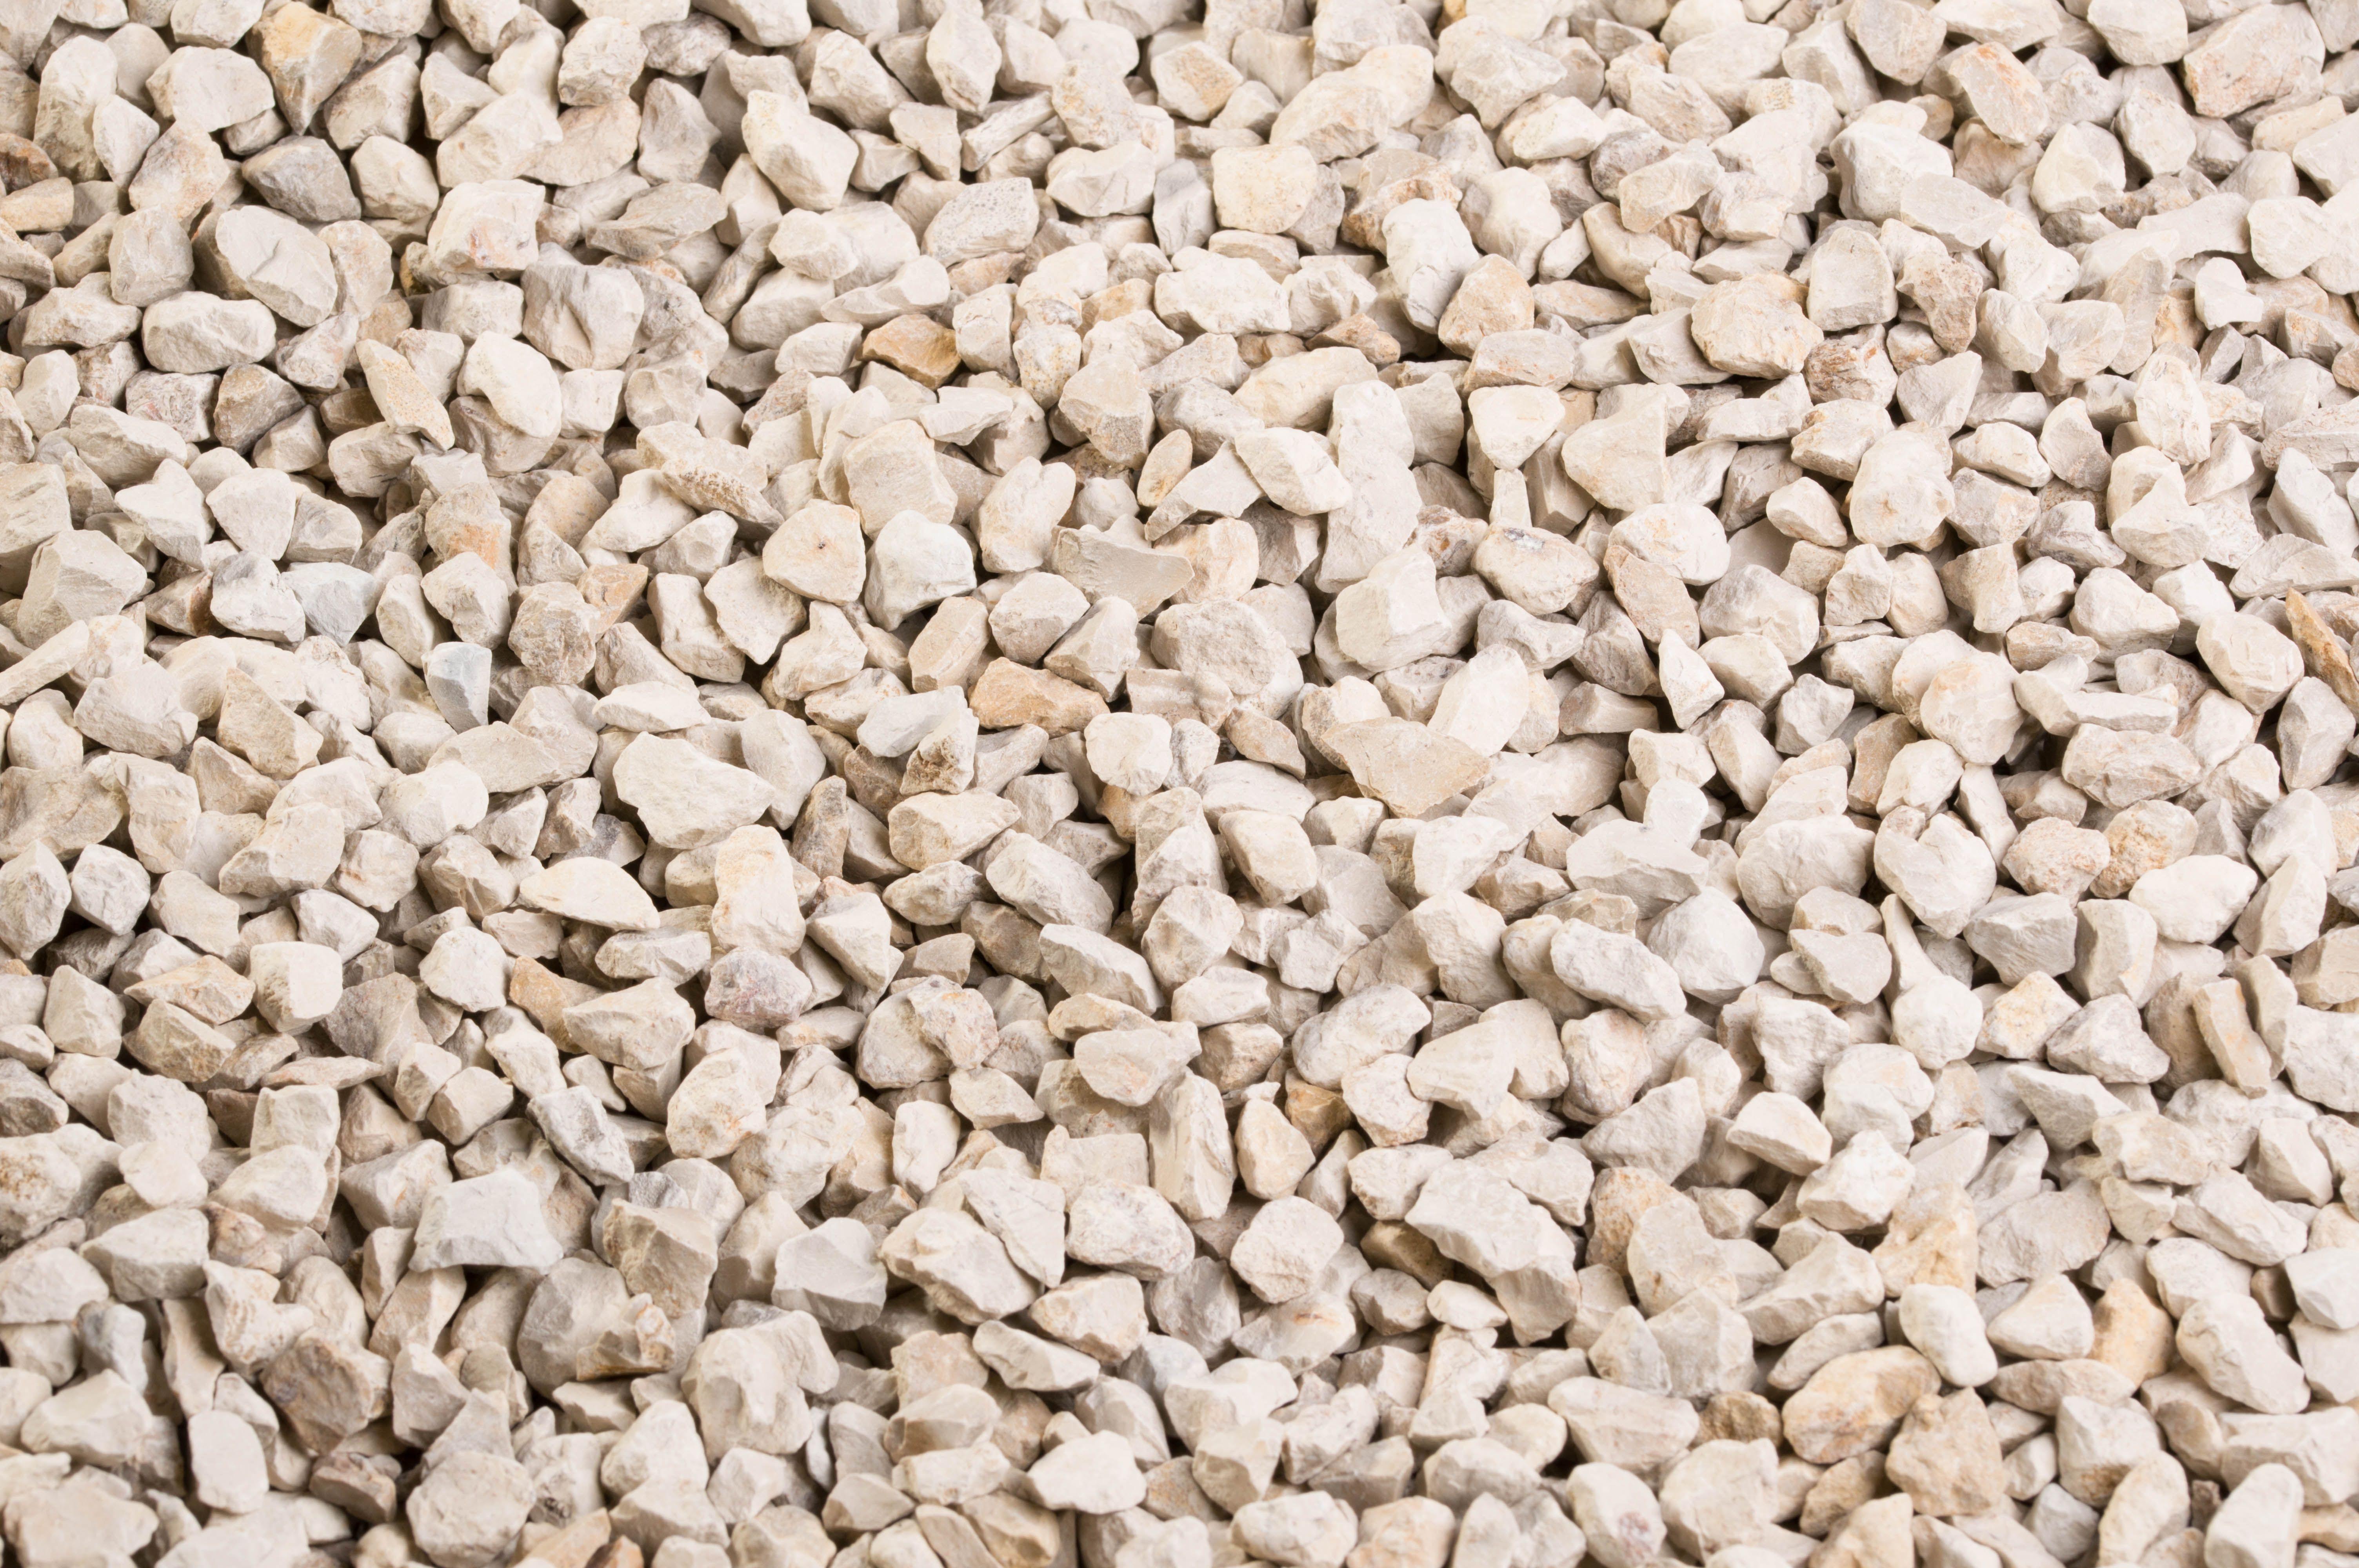 le versailles 6 10 mm est un gravillon d coratif de calcaire dans les tons beige clair id al. Black Bedroom Furniture Sets. Home Design Ideas